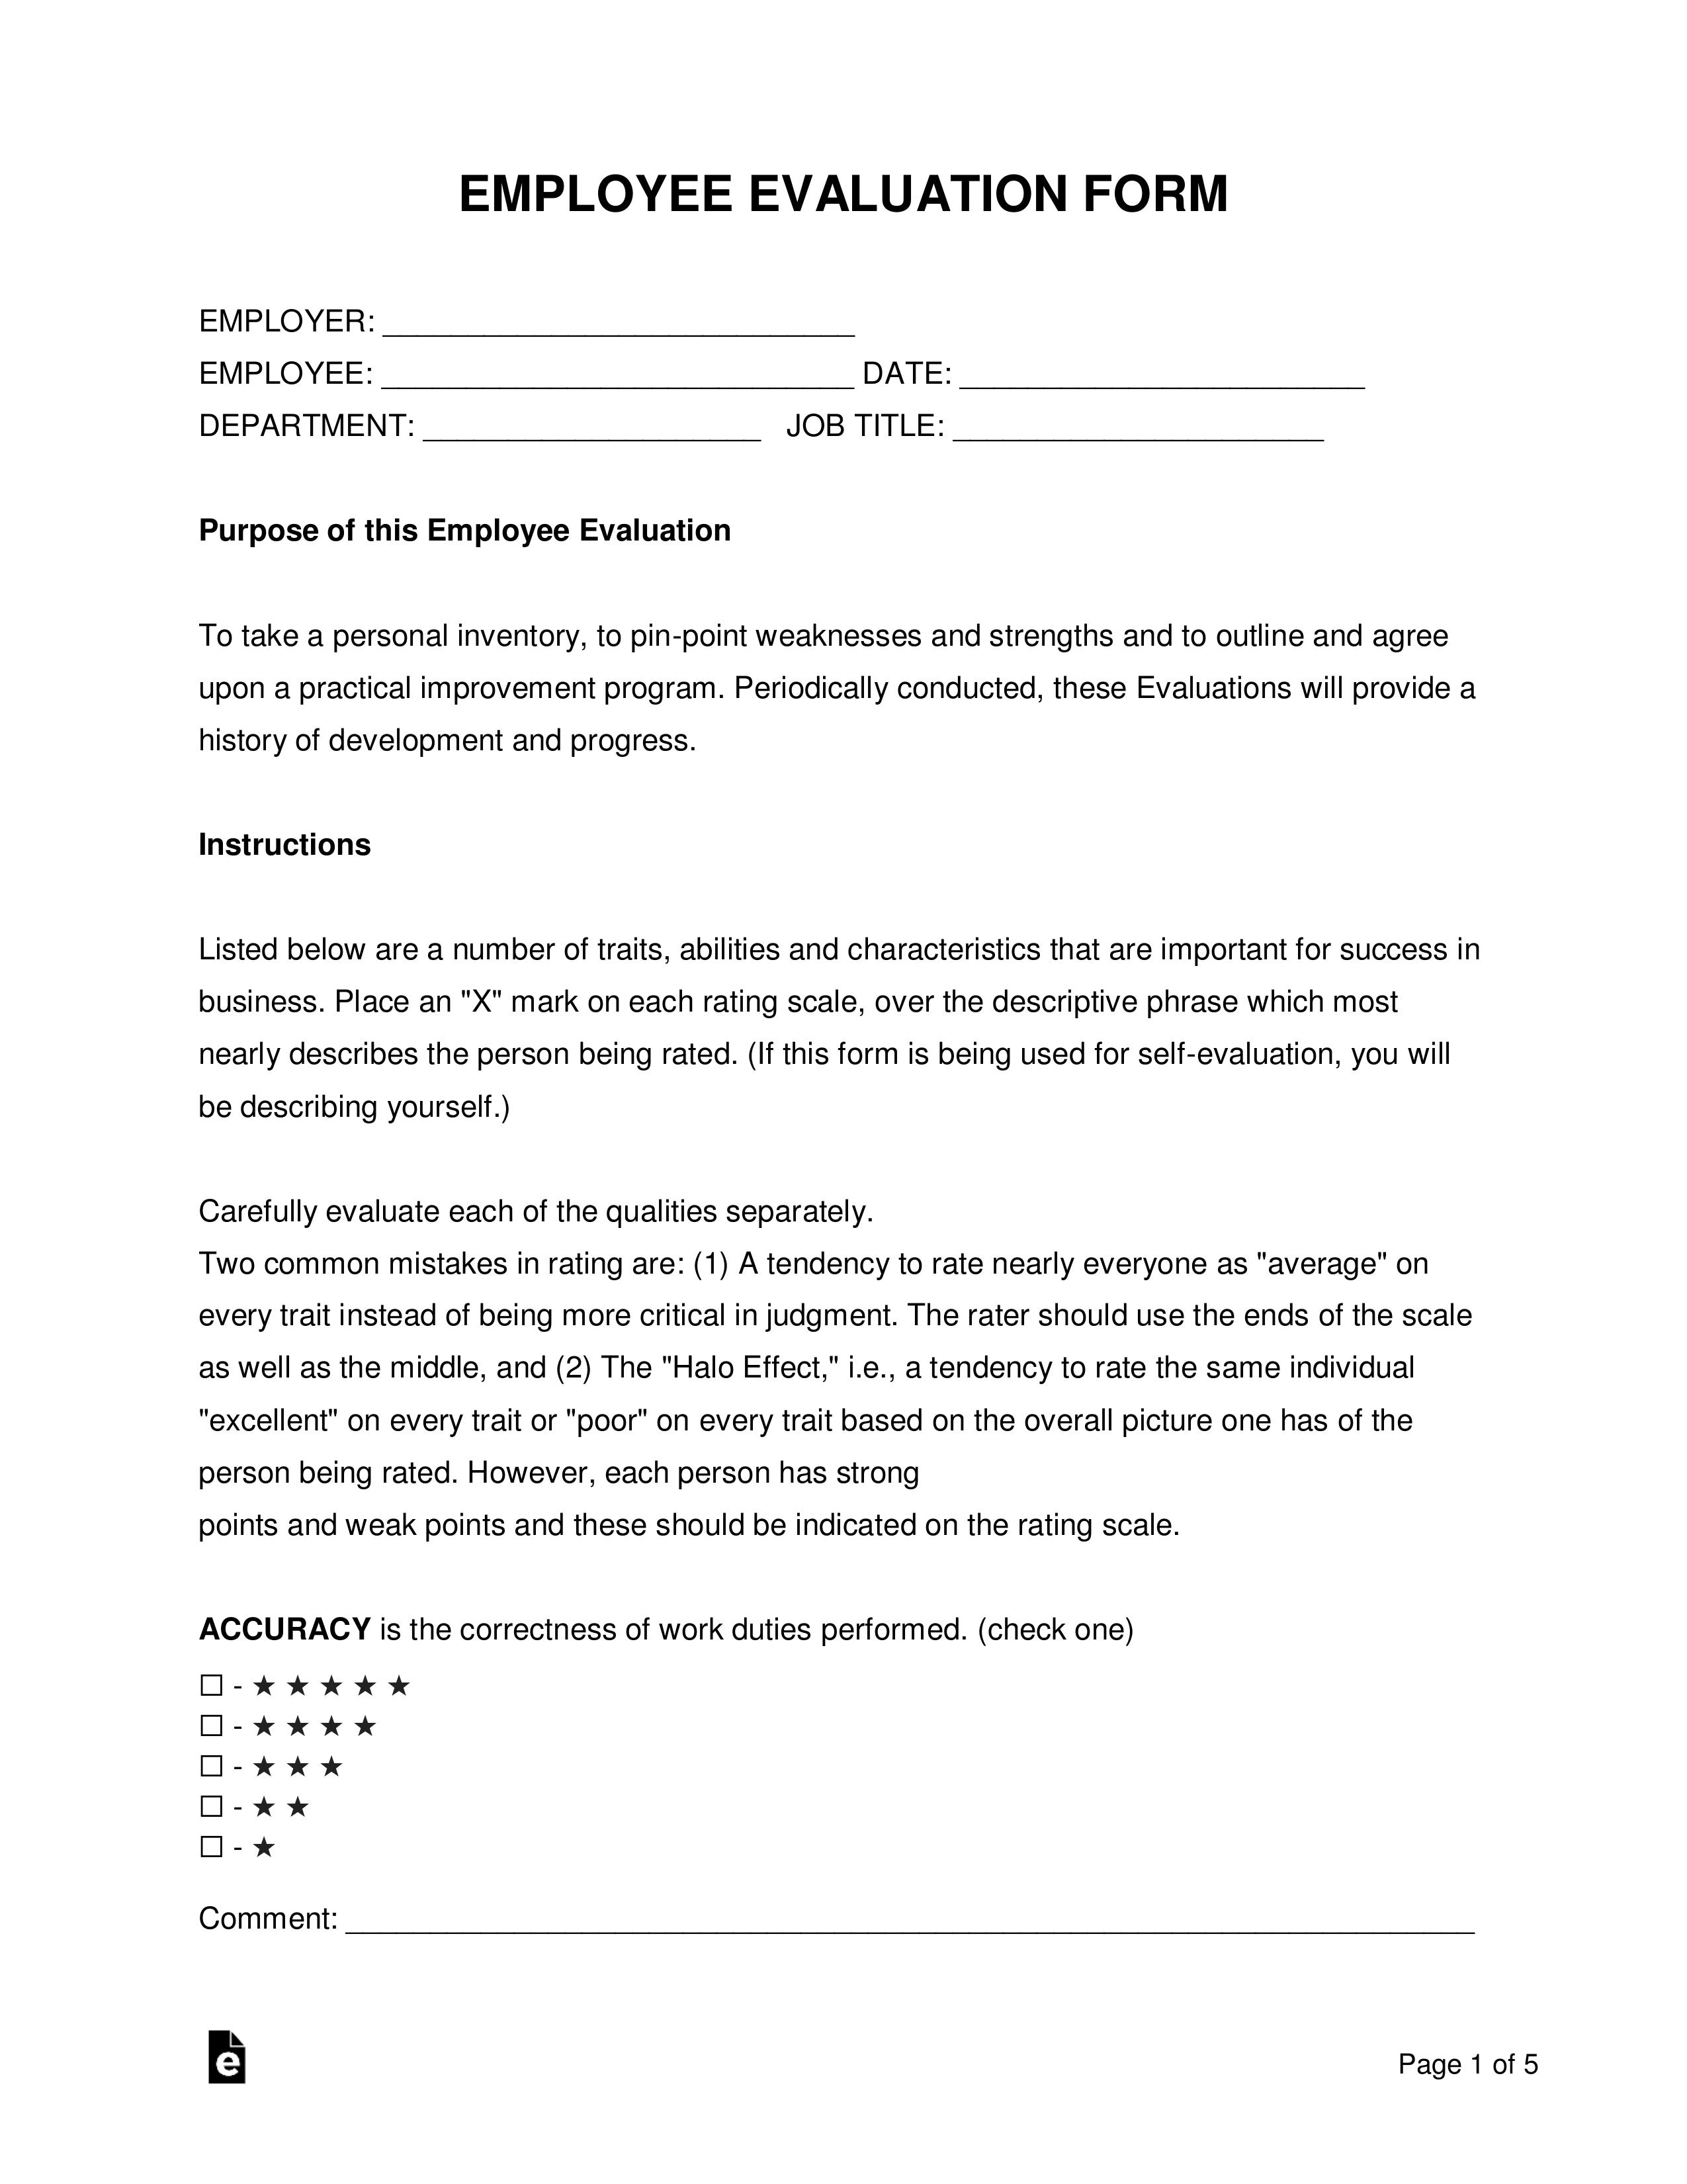 Free Employee Evaluation Form Pdf Word Eforms